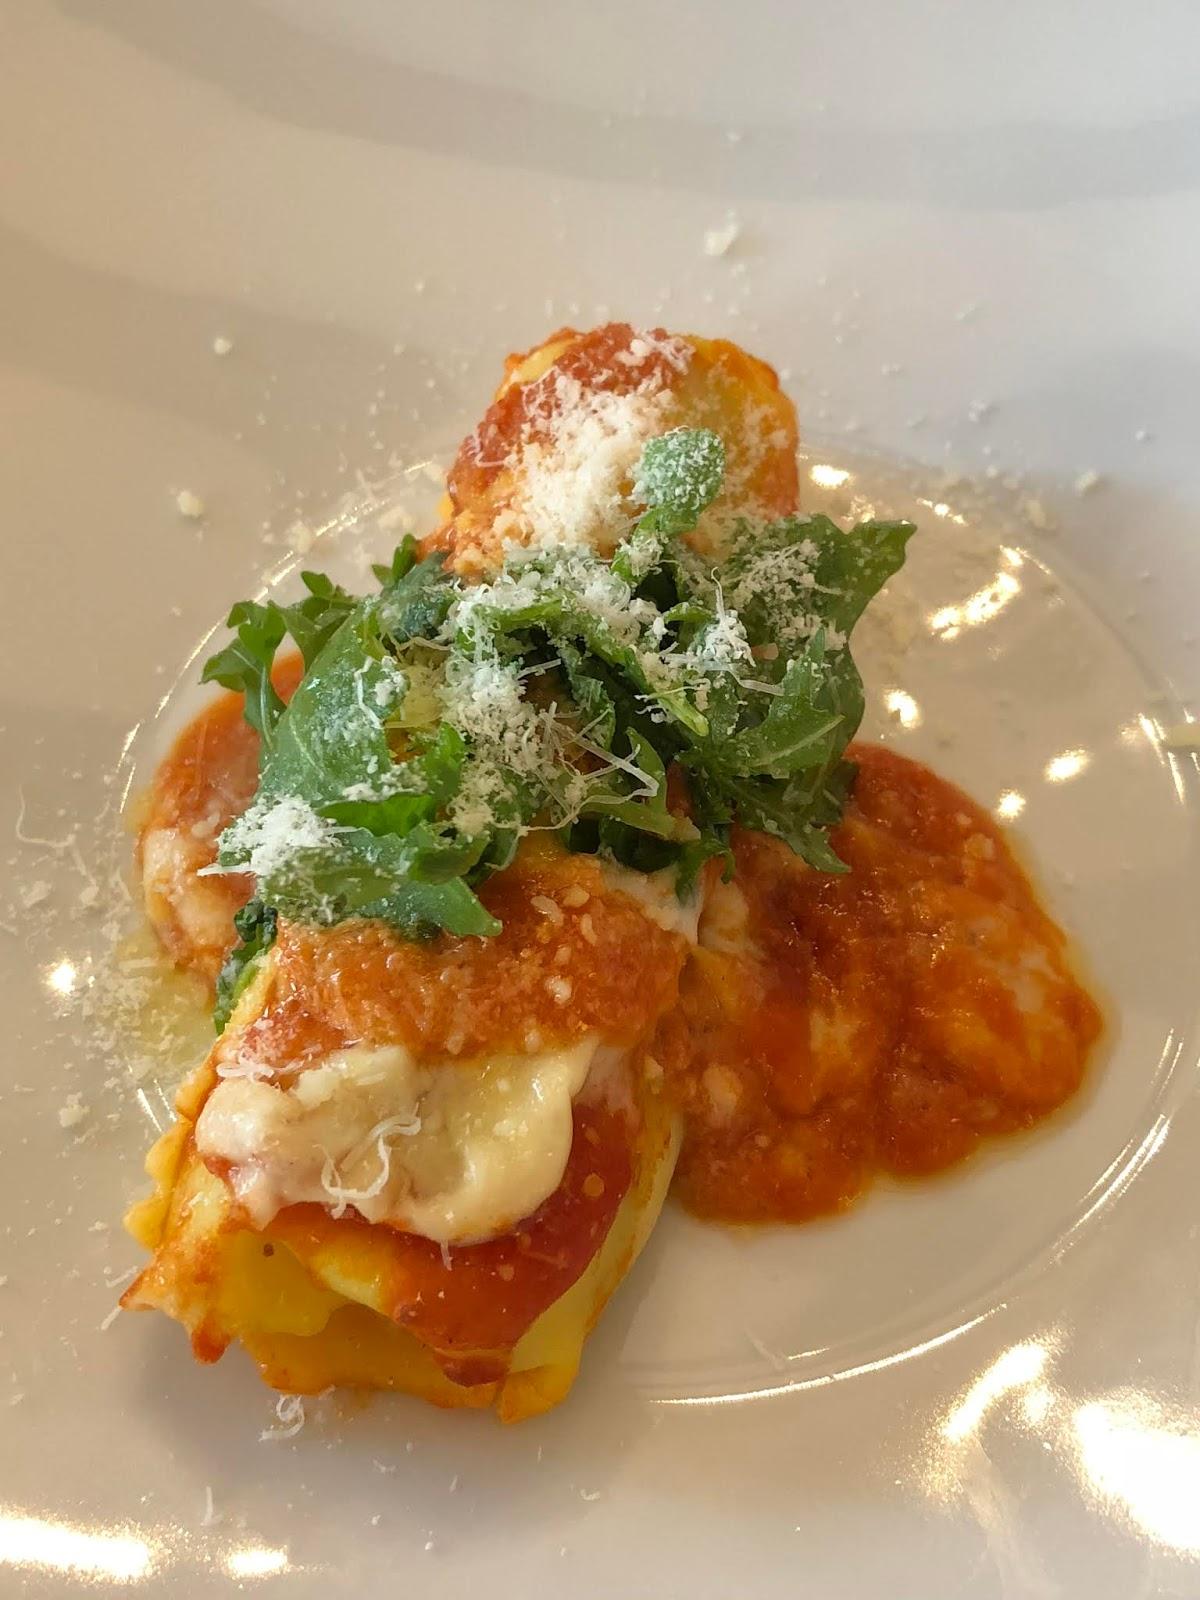 Hausgemachte Cannelloni, Restaurant Scarpati, Wuppertal